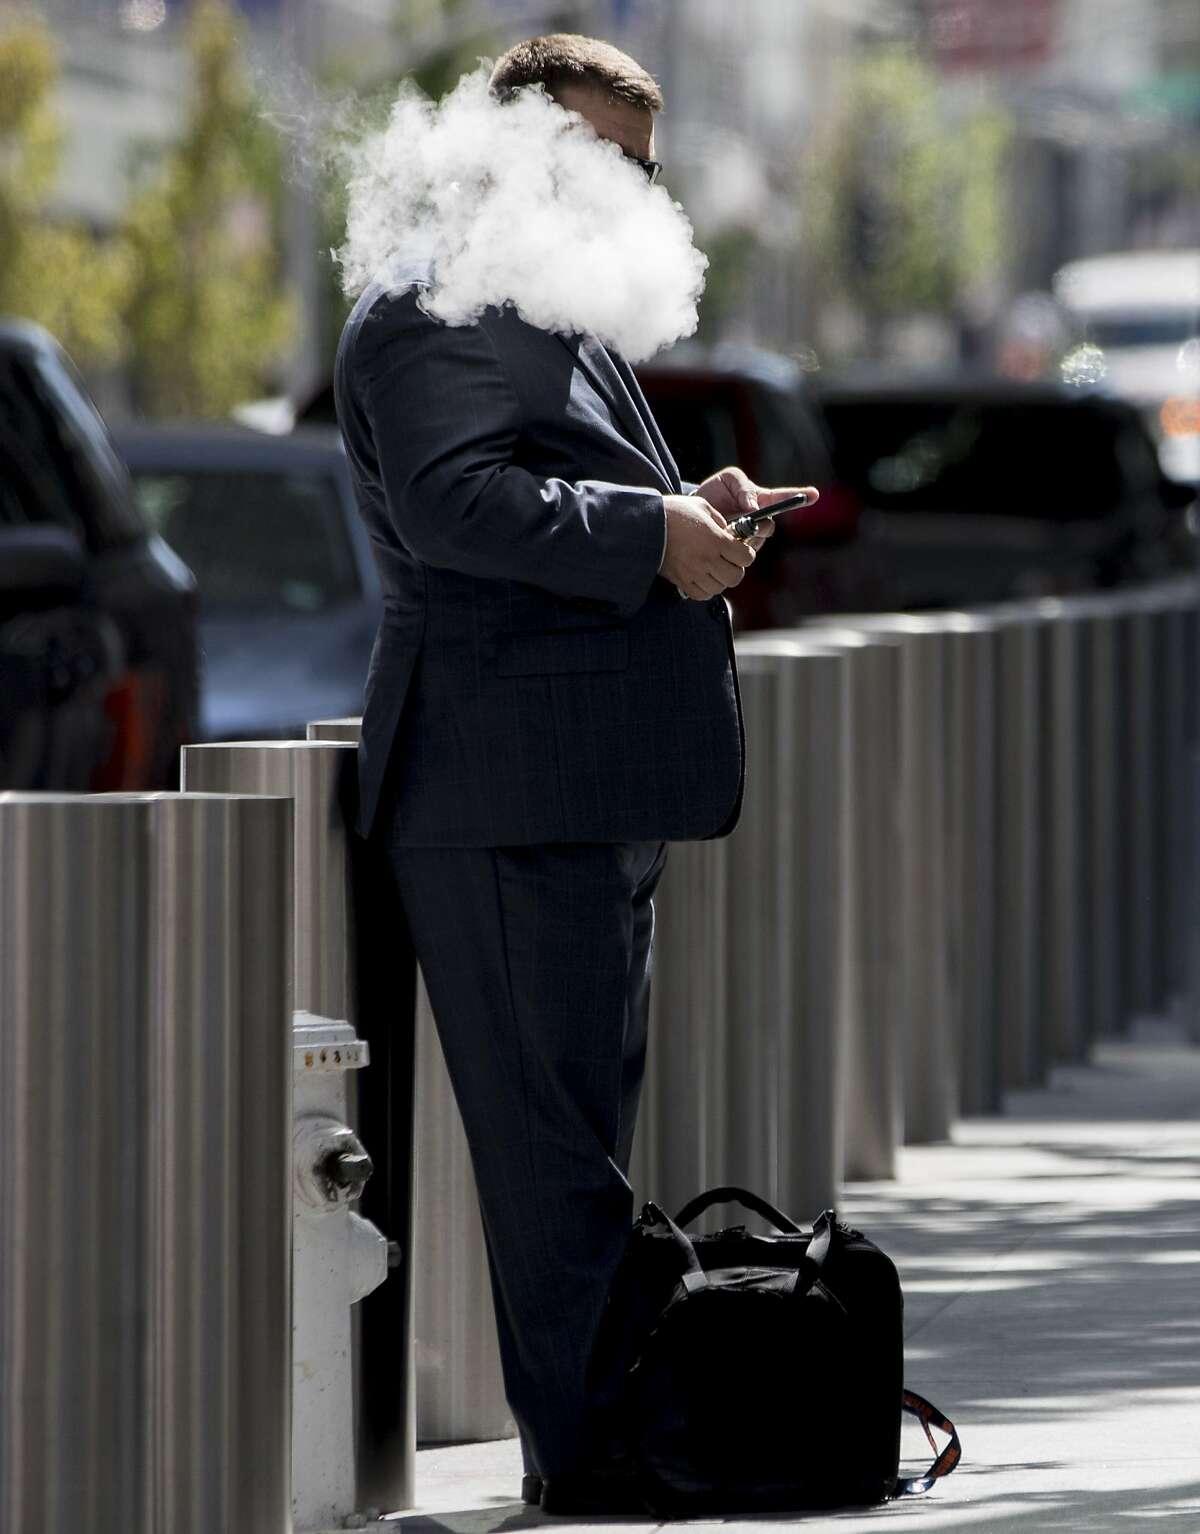 A man smokes an e-cigarette outside of the Transbay Transit Center in San Francisco, Calif. Thursday, September 19, 2019.